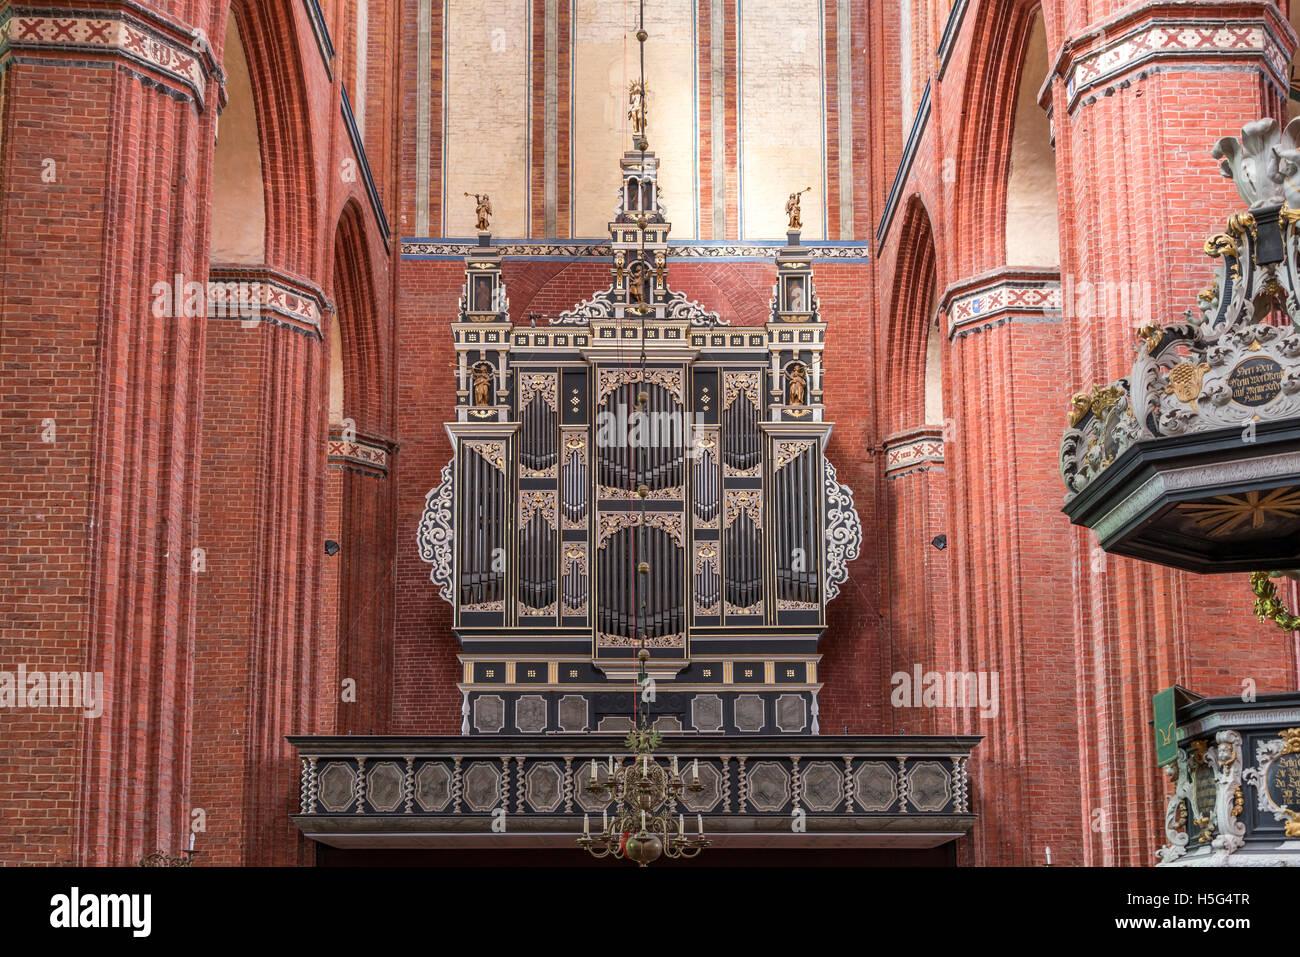 St. Nicholas church organ, Hanseatic City of Wismar, Mecklenburg-Vorpommern, Germany - Stock Image